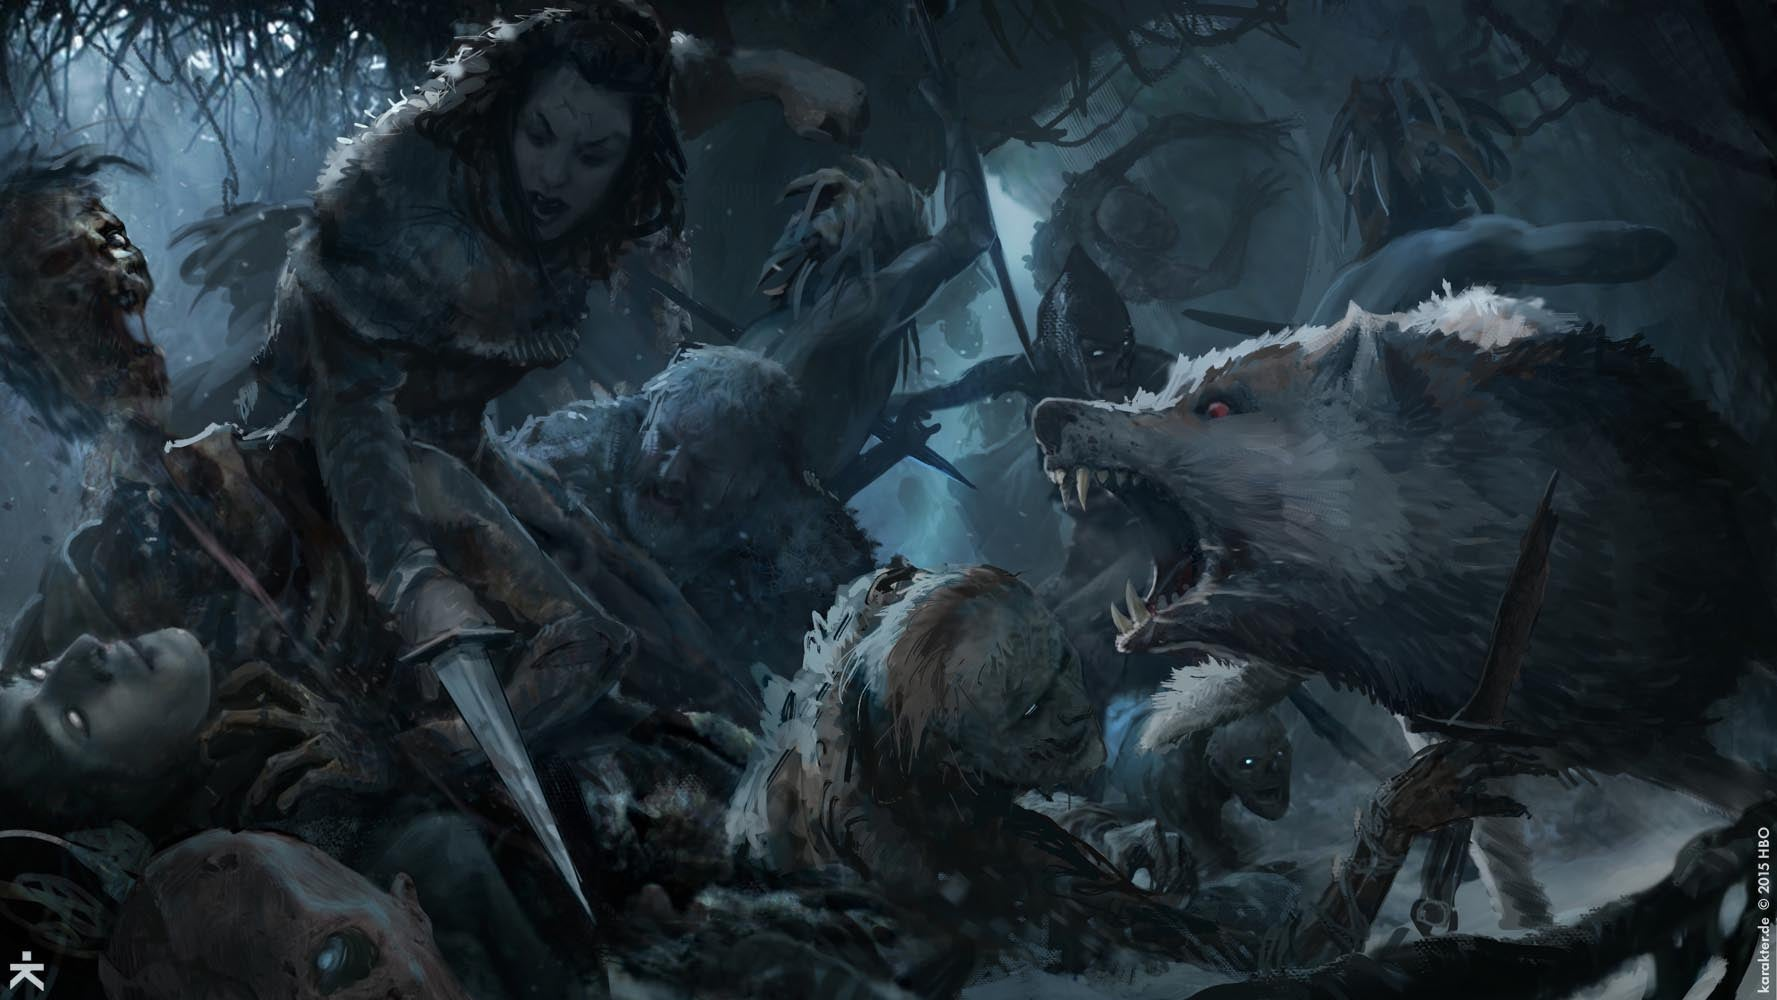 Fine Art The Art Of Game Of Thrones Season 6 Kotaku